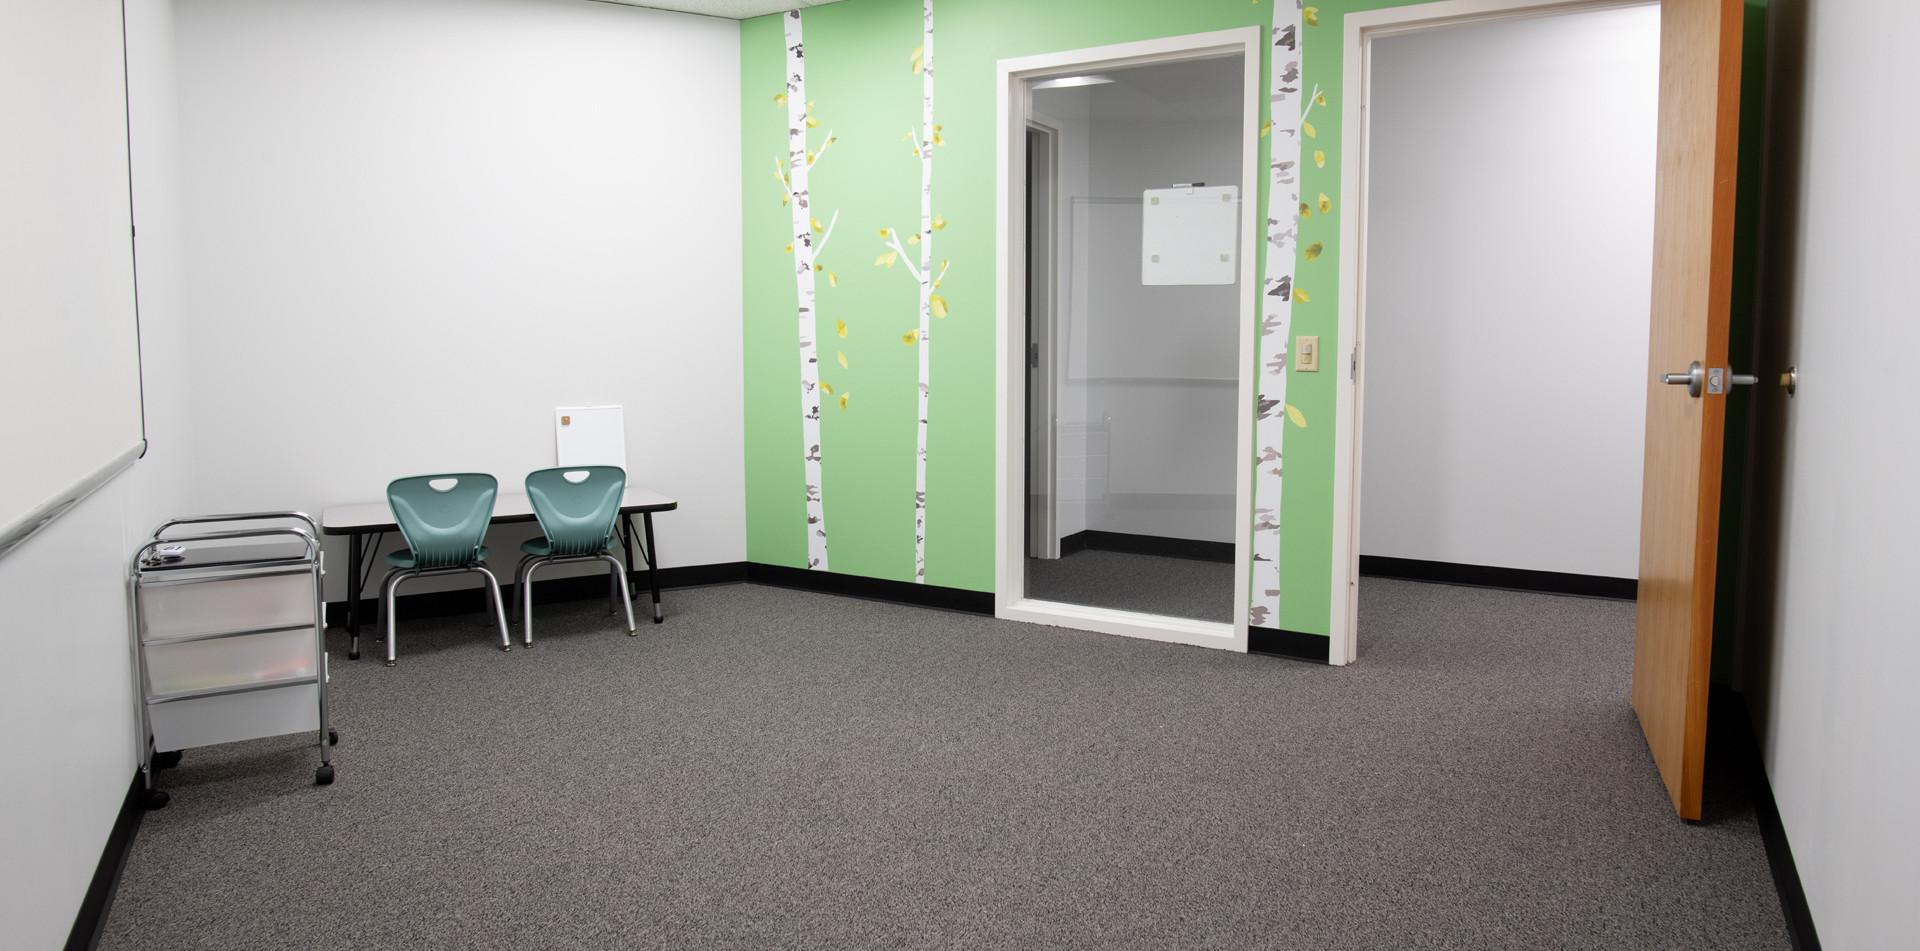 Denver Center Treatment Room 2